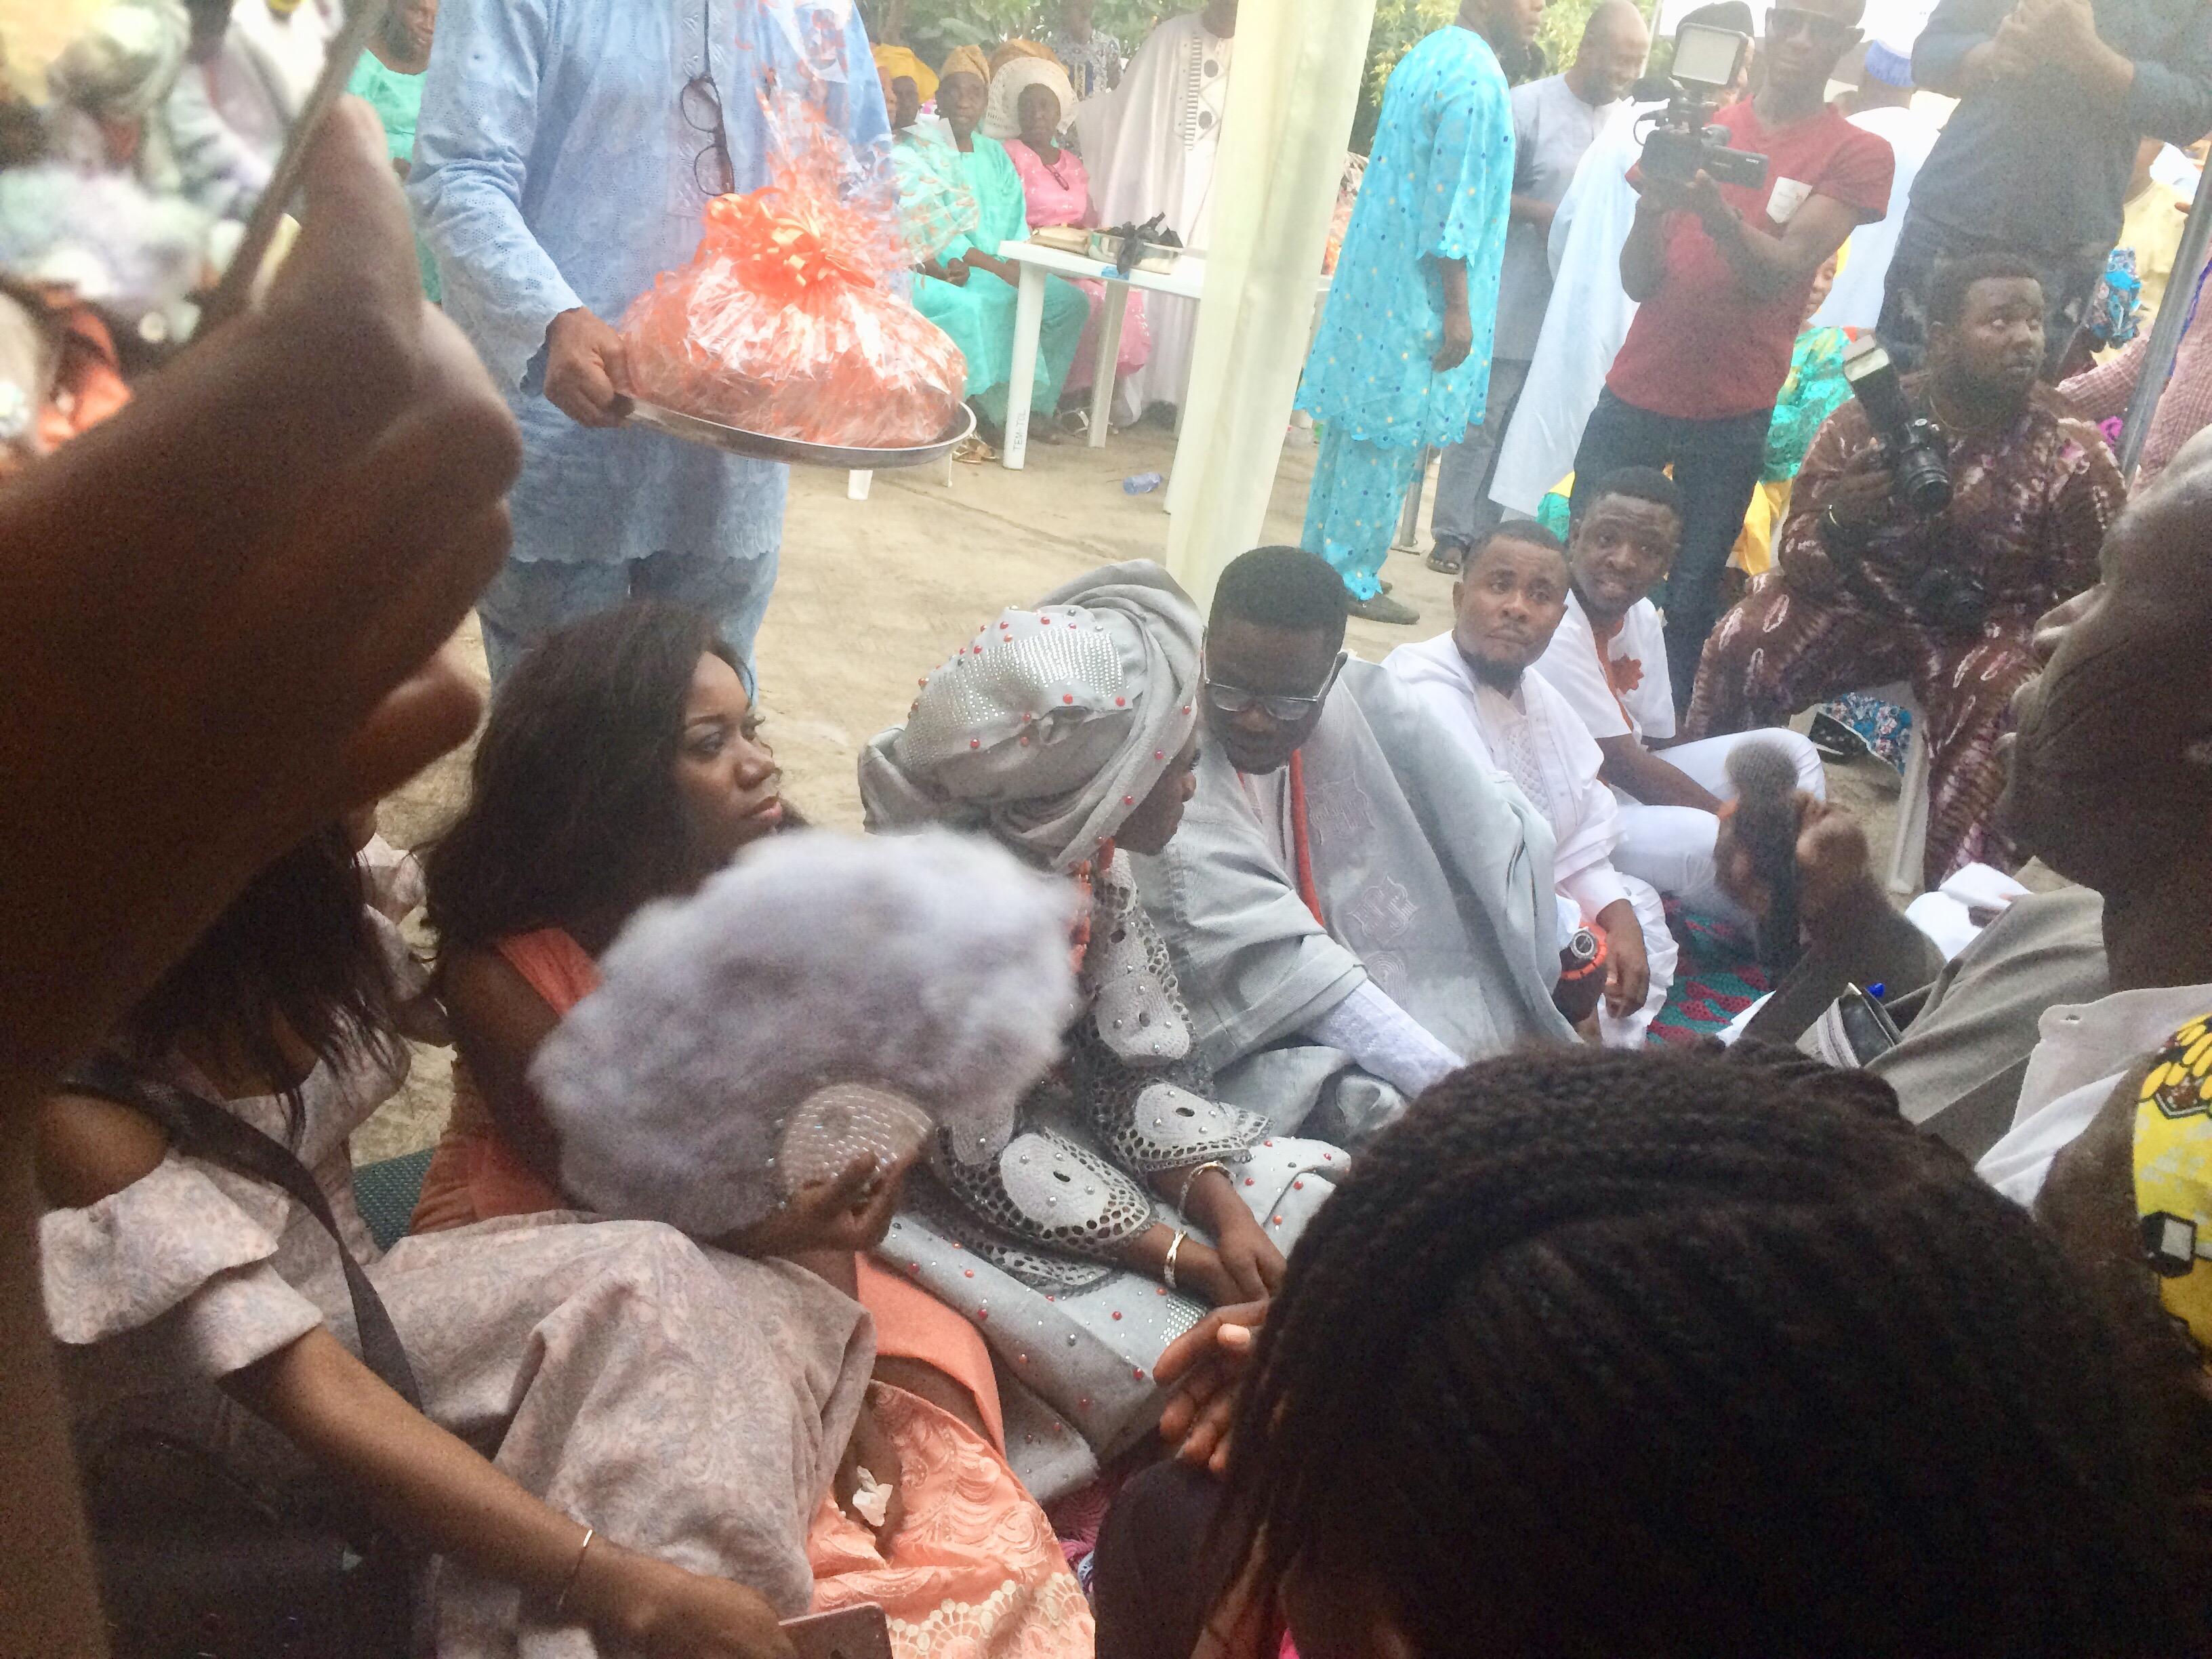 Bride and groom conversing